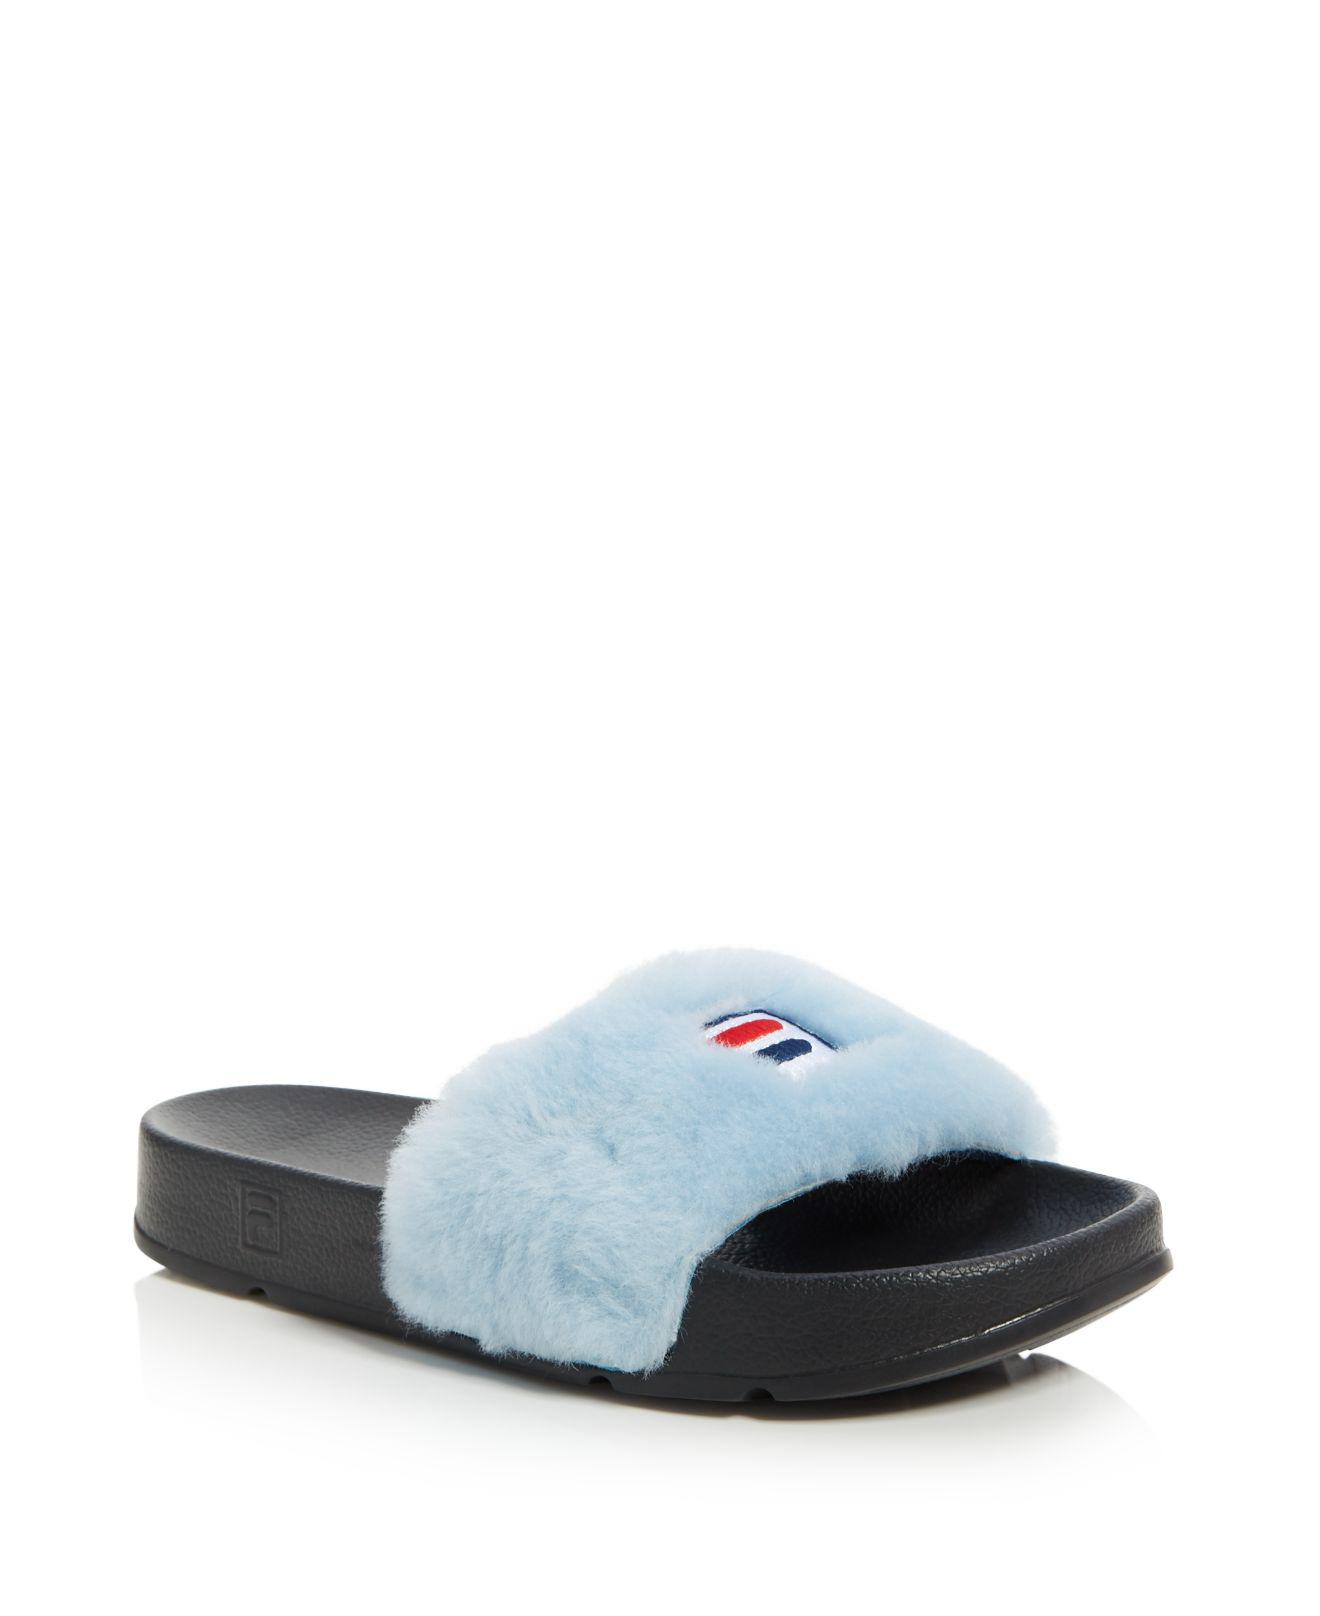 Baja East x FILA Shearling Slide Sandals sale nicekicks shop cheap price buy cheap fake great deals cheap online FP0PicyT